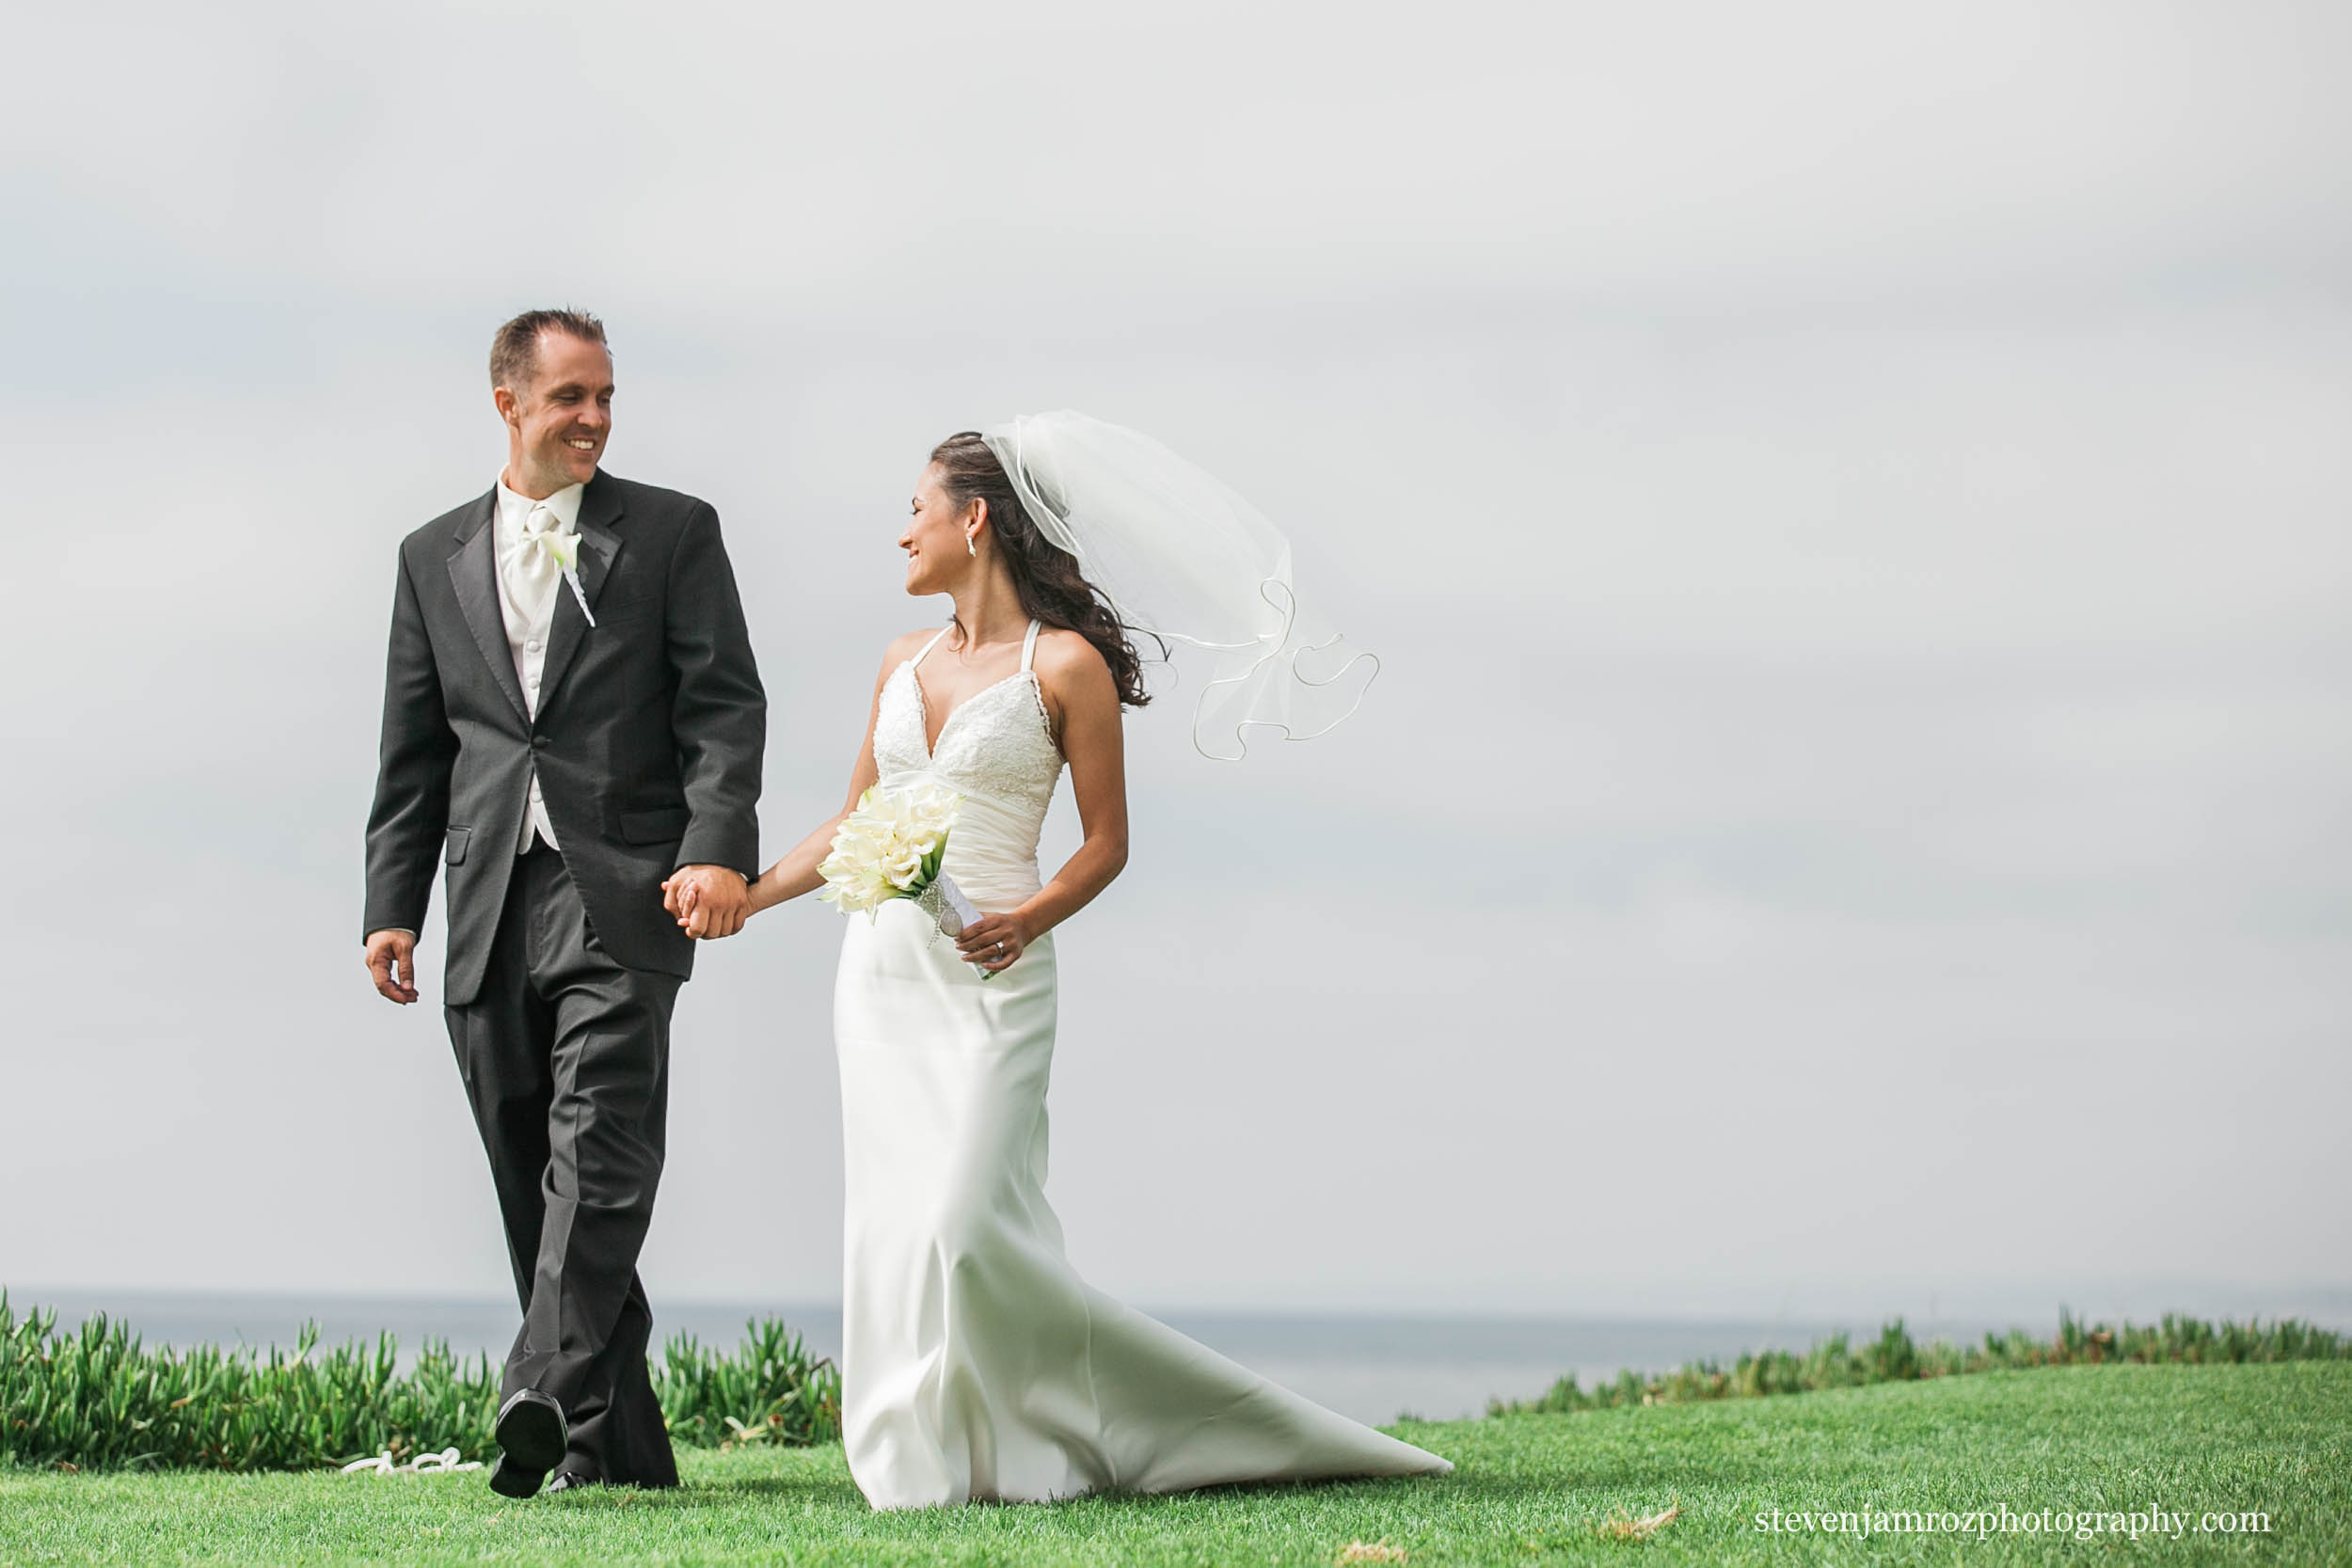 beach-wedding-nc-steven-jamroz-photography-0478.jpg